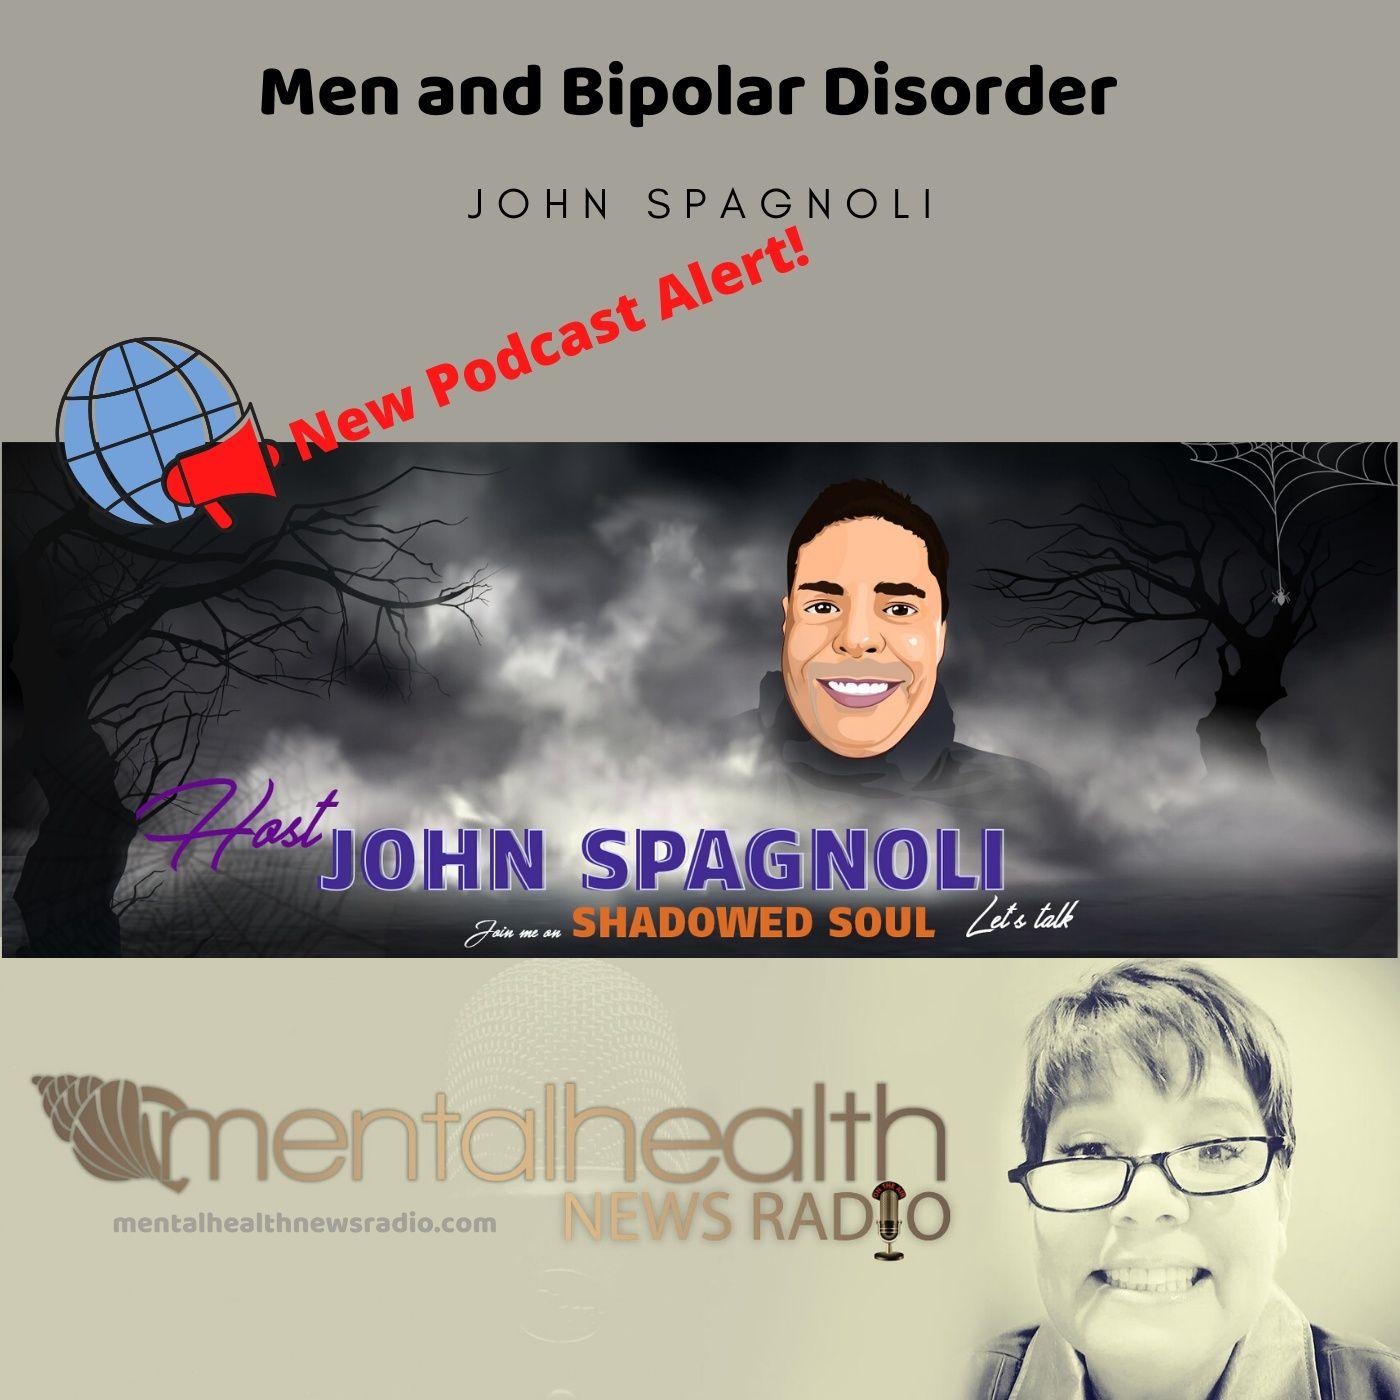 Mental Health News Radio - Shadowed Soul: Men and Bipolar Disorder with John Spagnoli